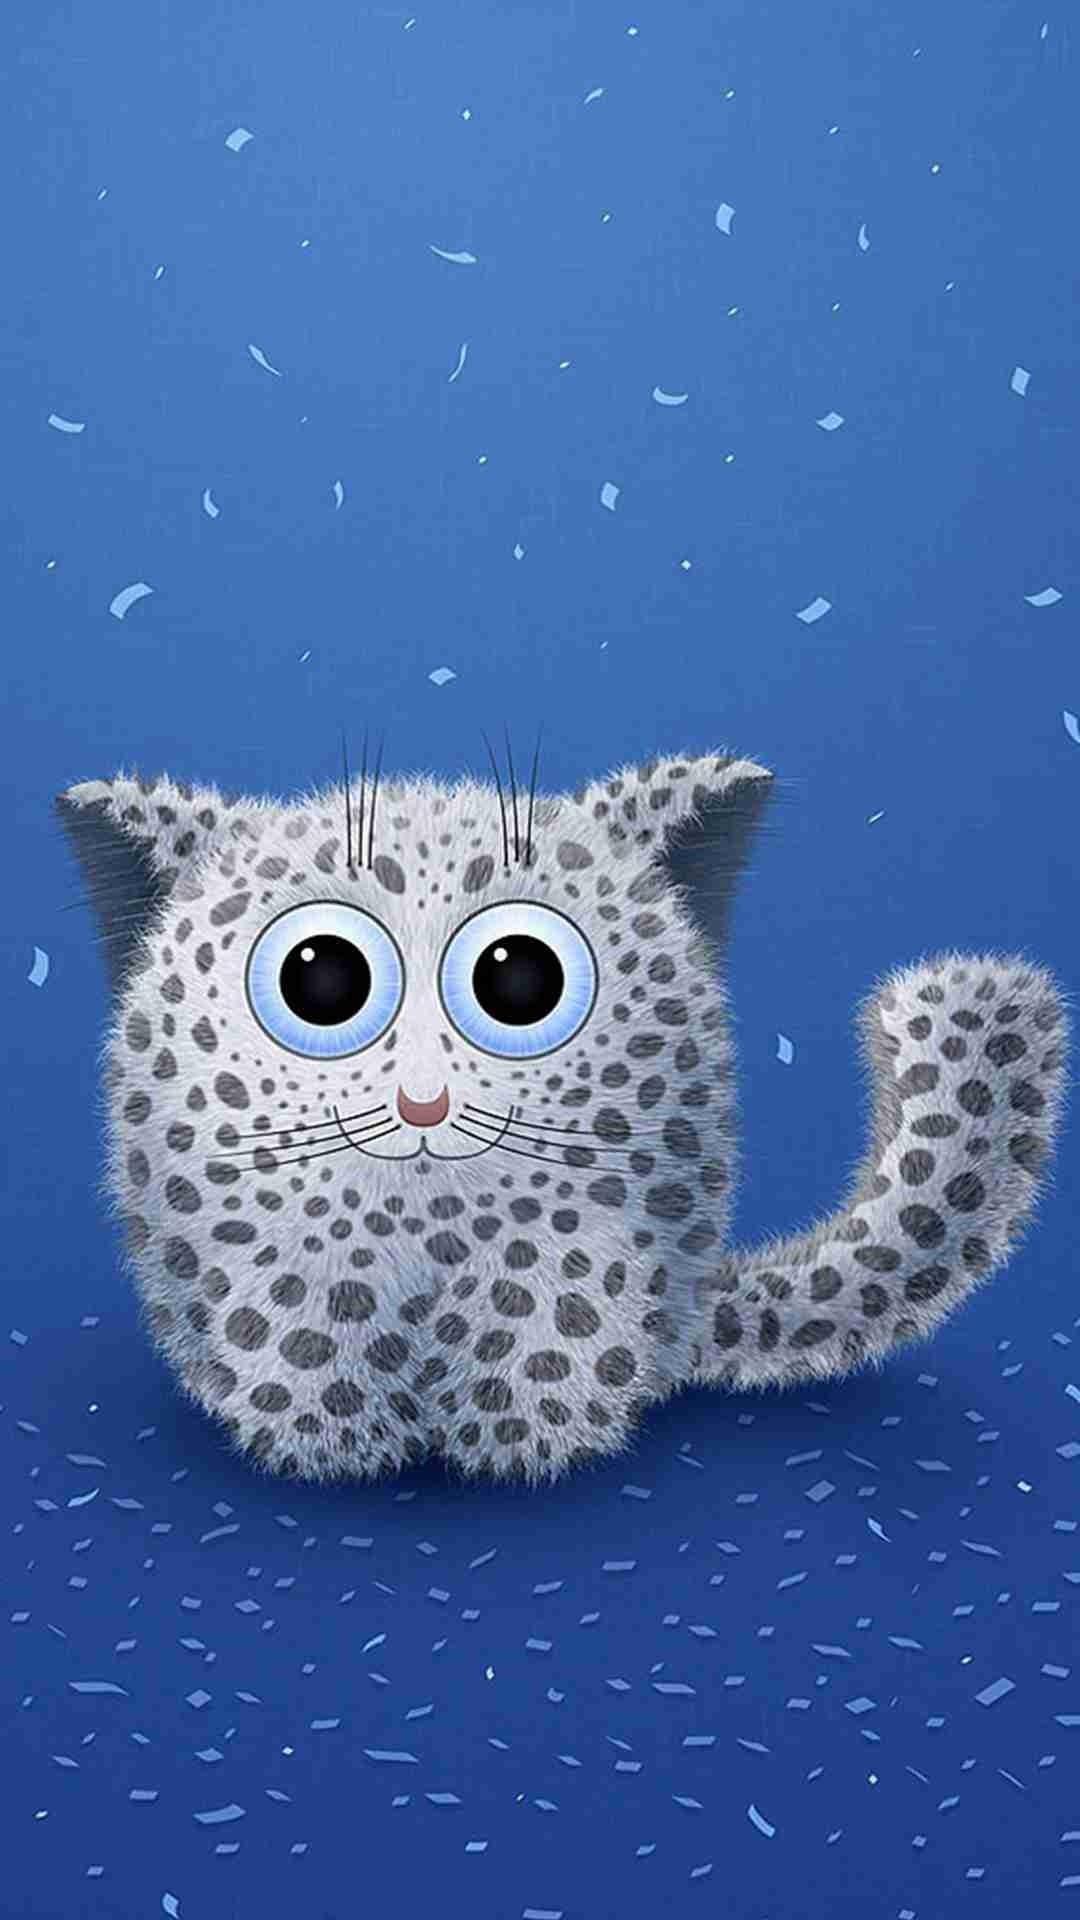 Cute Cartoon Polka Dot Cat iphone 6 Plus Wallpaper – Kitty .